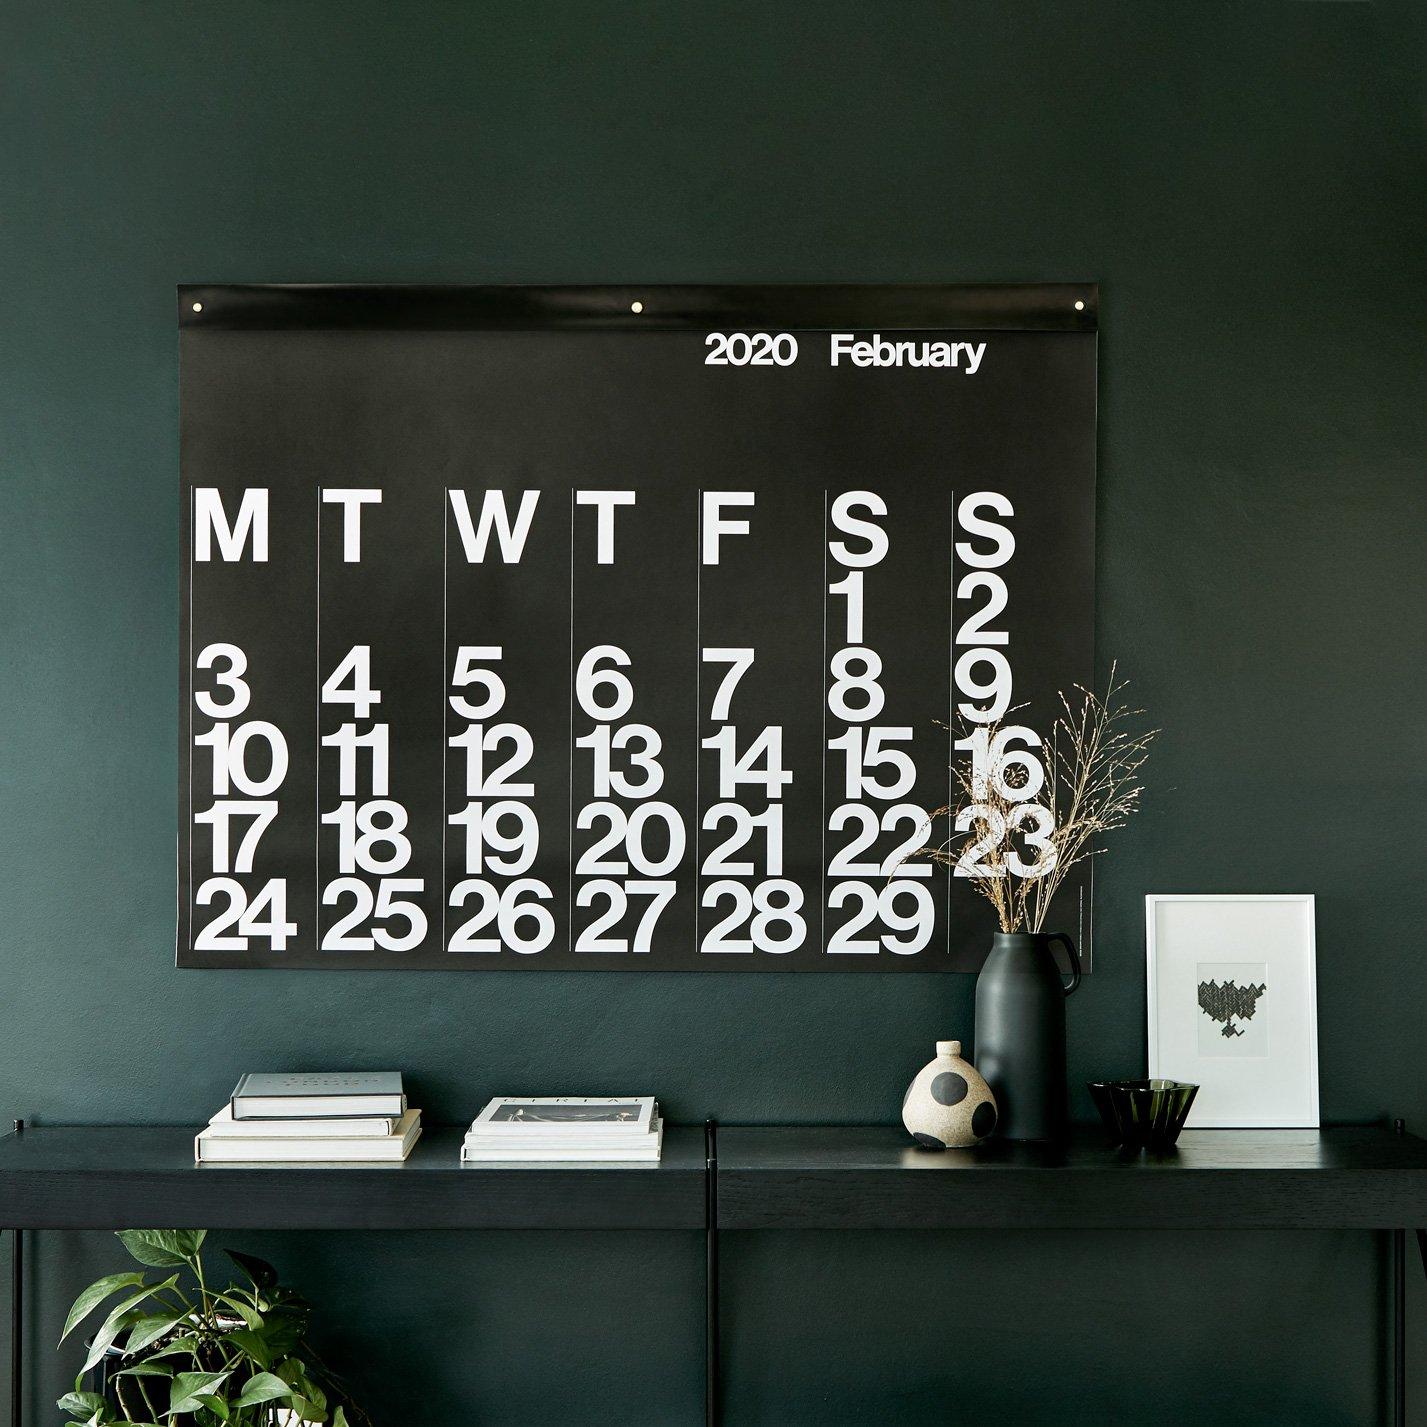 Stendig Calendar 2020 Black created by Massimo Vignelli